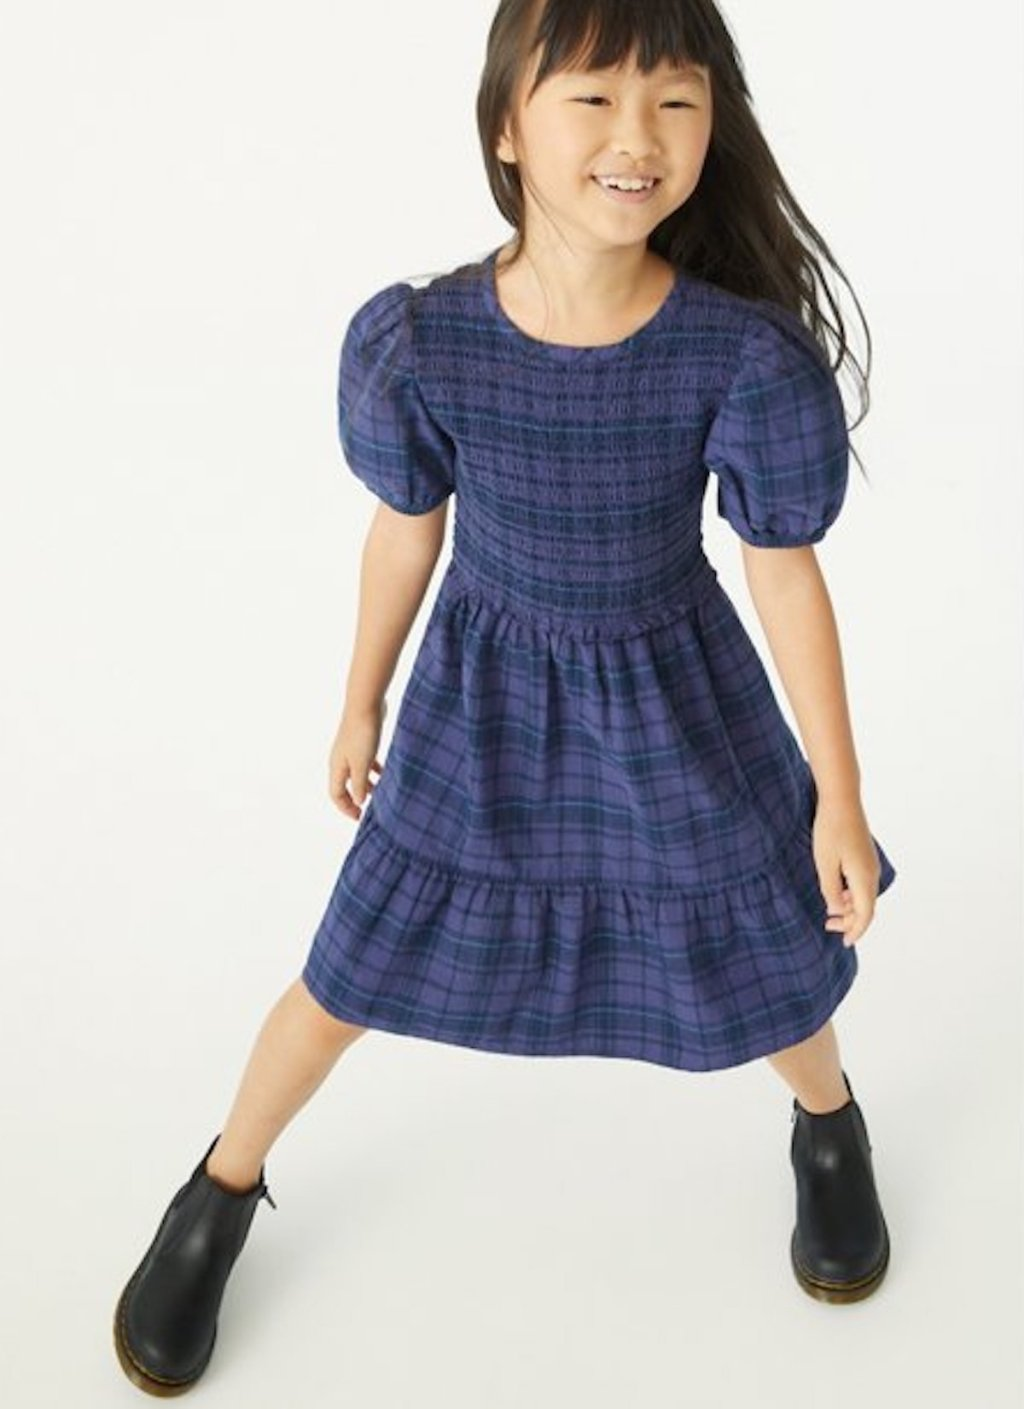 stock photo of girl wearing purple plaid dress